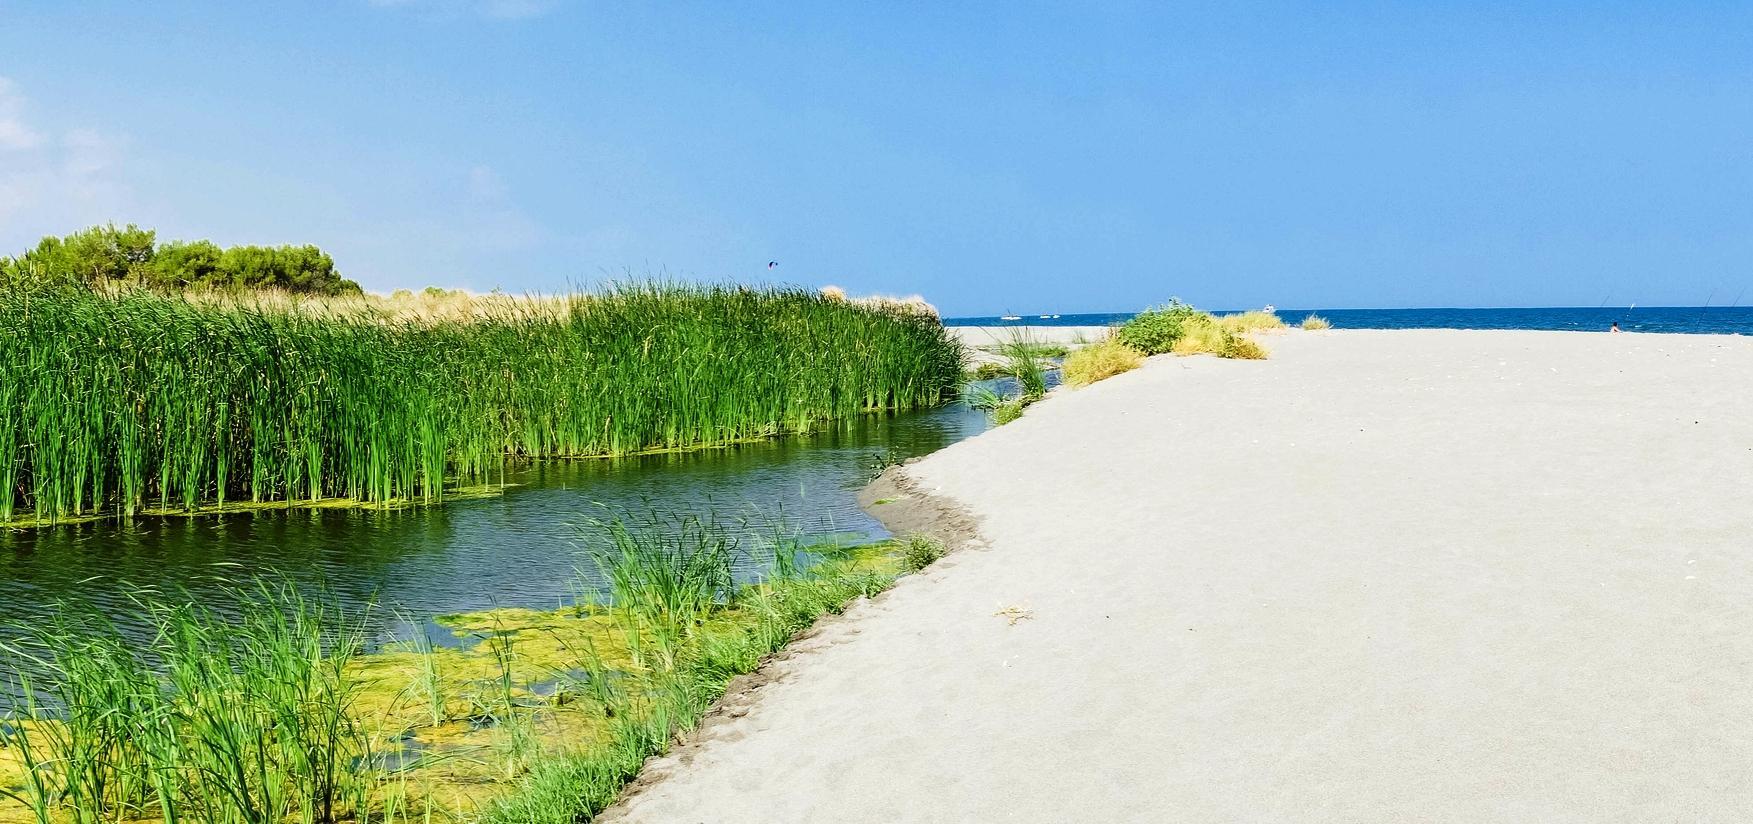 Basilicata jonica: tra mare, natura e storia